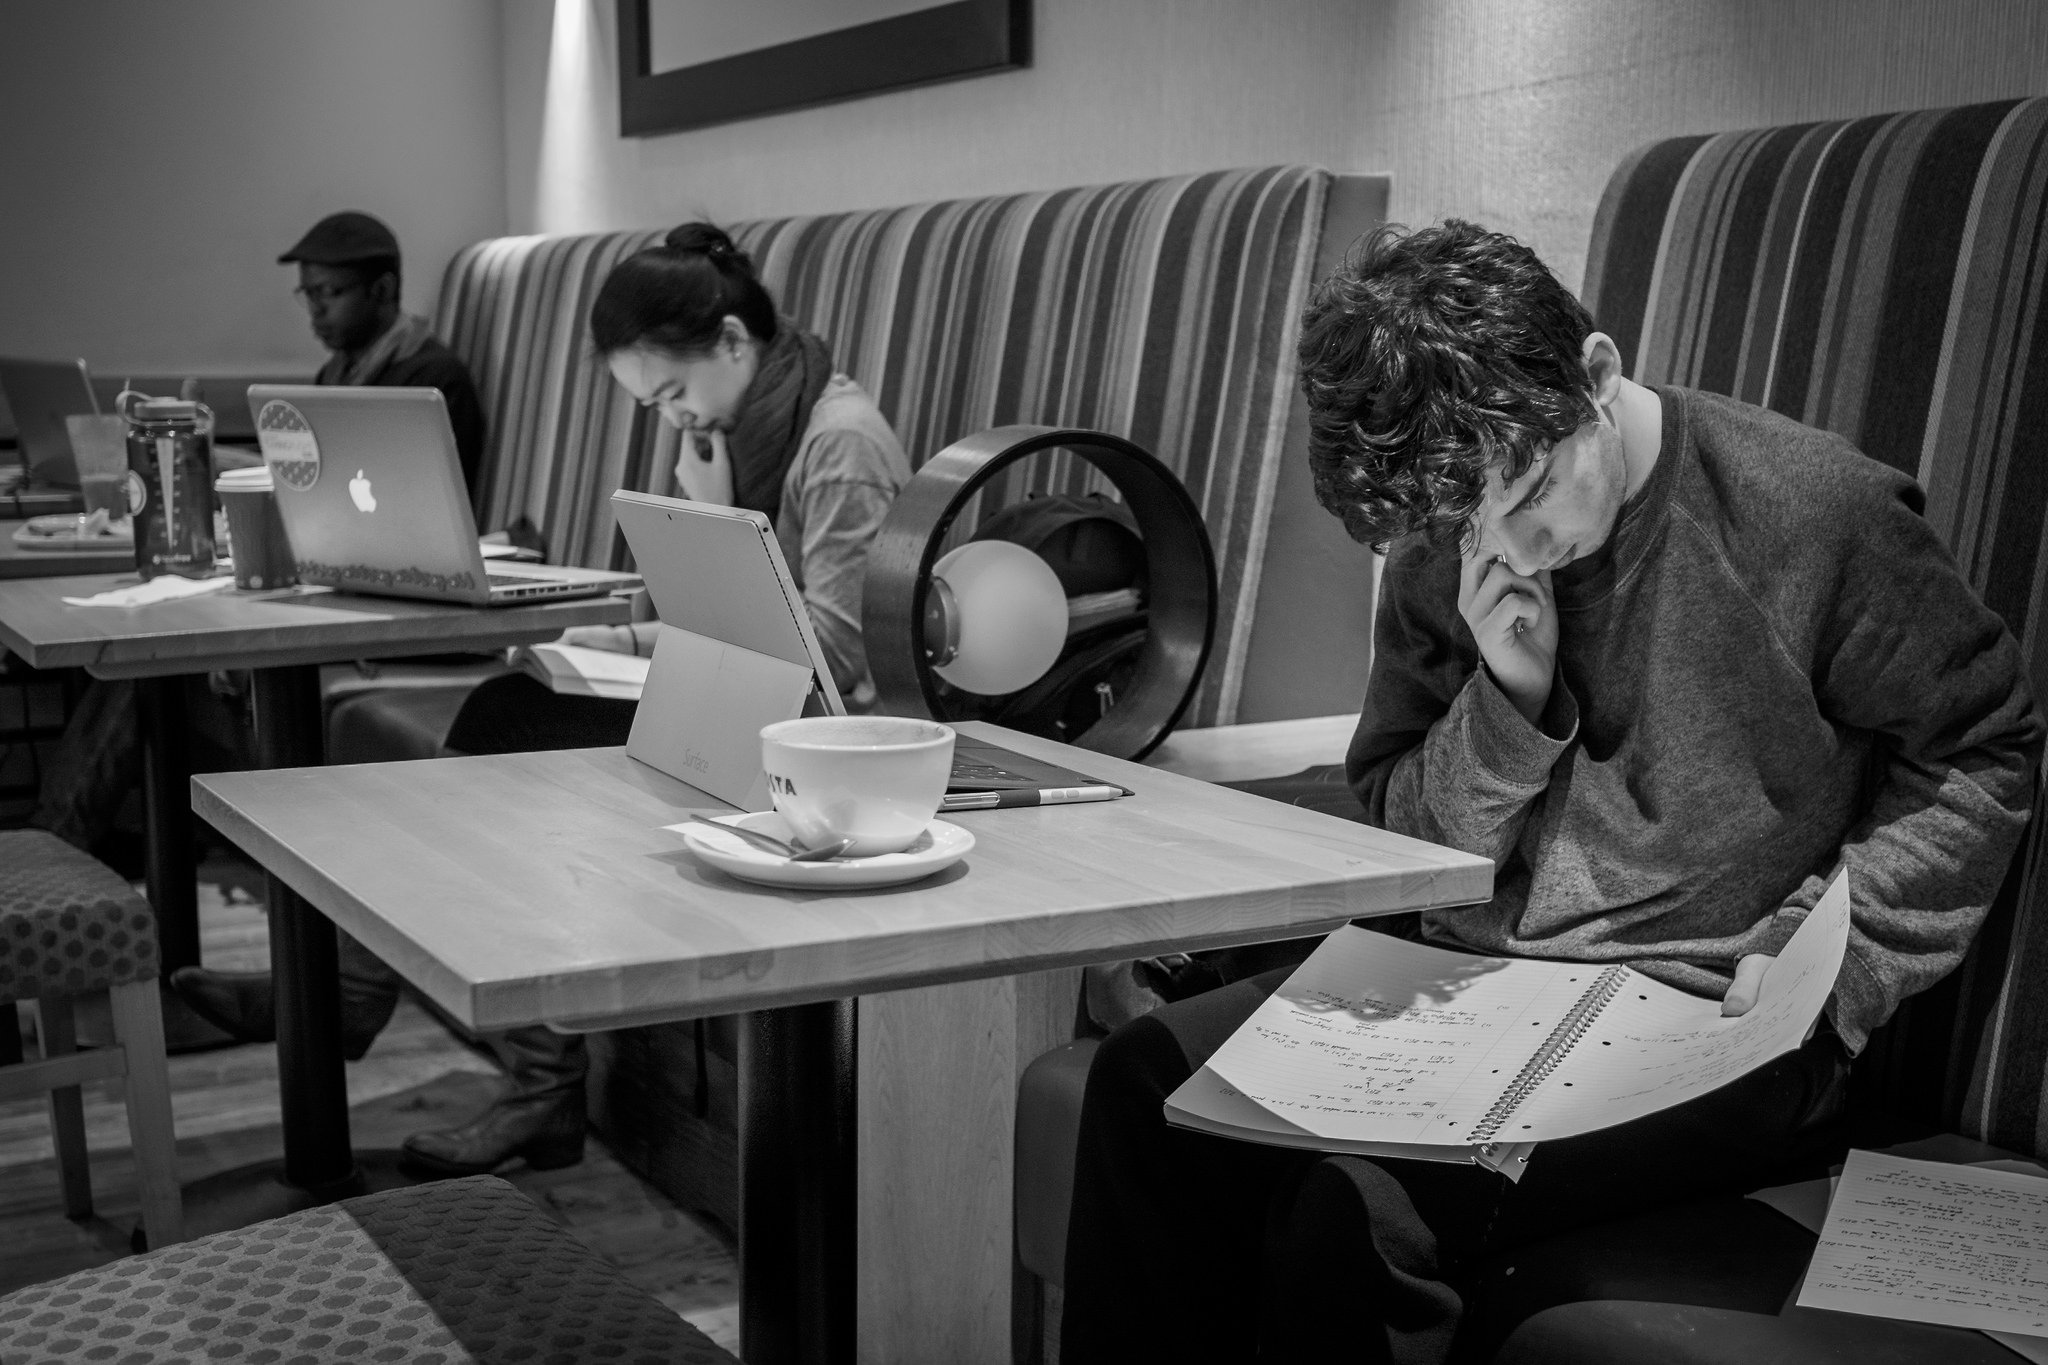 Cómo encontrar un curso online de periodismo https://t.co/p21OIcwDWp vía @ijnetEs https://t.co/dQNOKKkkS6